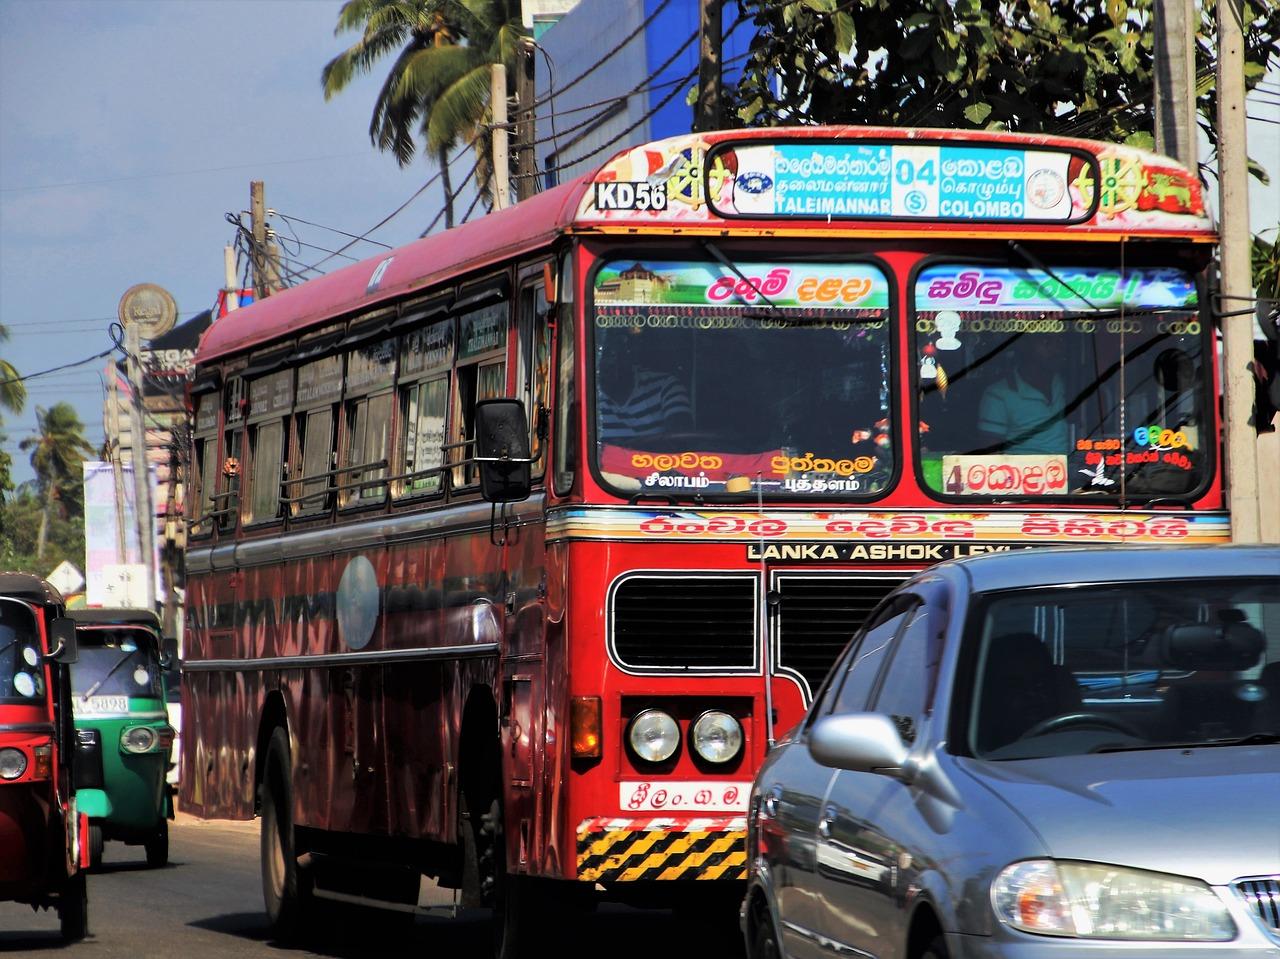 Автобус. Шри-Ланка